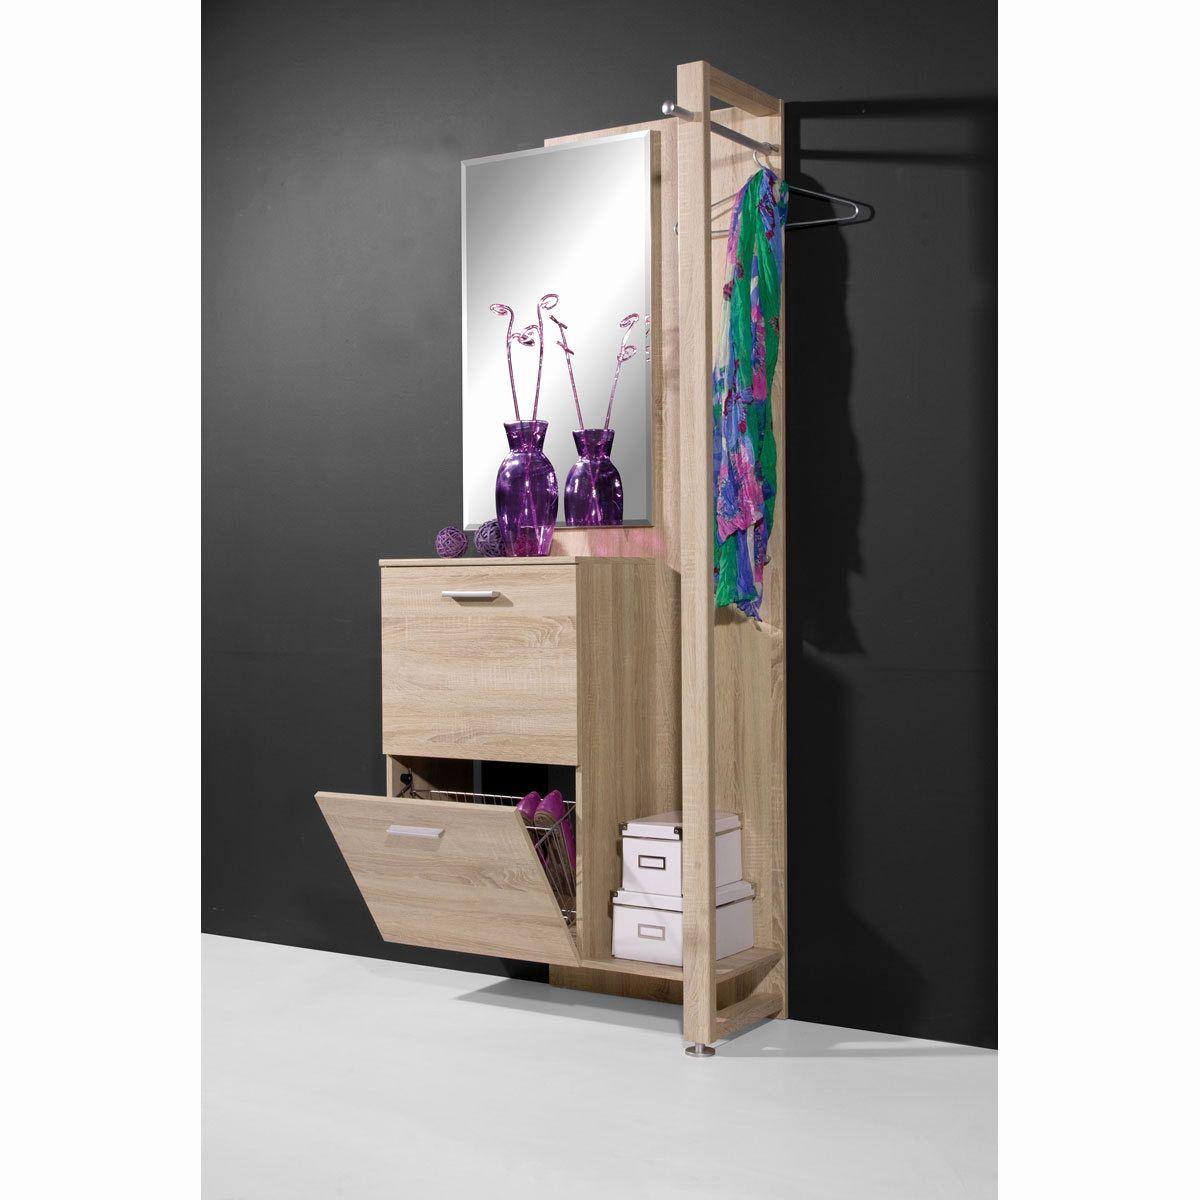 Meuble entree design pas cher luxury meuble entree vestiaire pas cher couloir pinterest - Meuble entree design pas cher ...